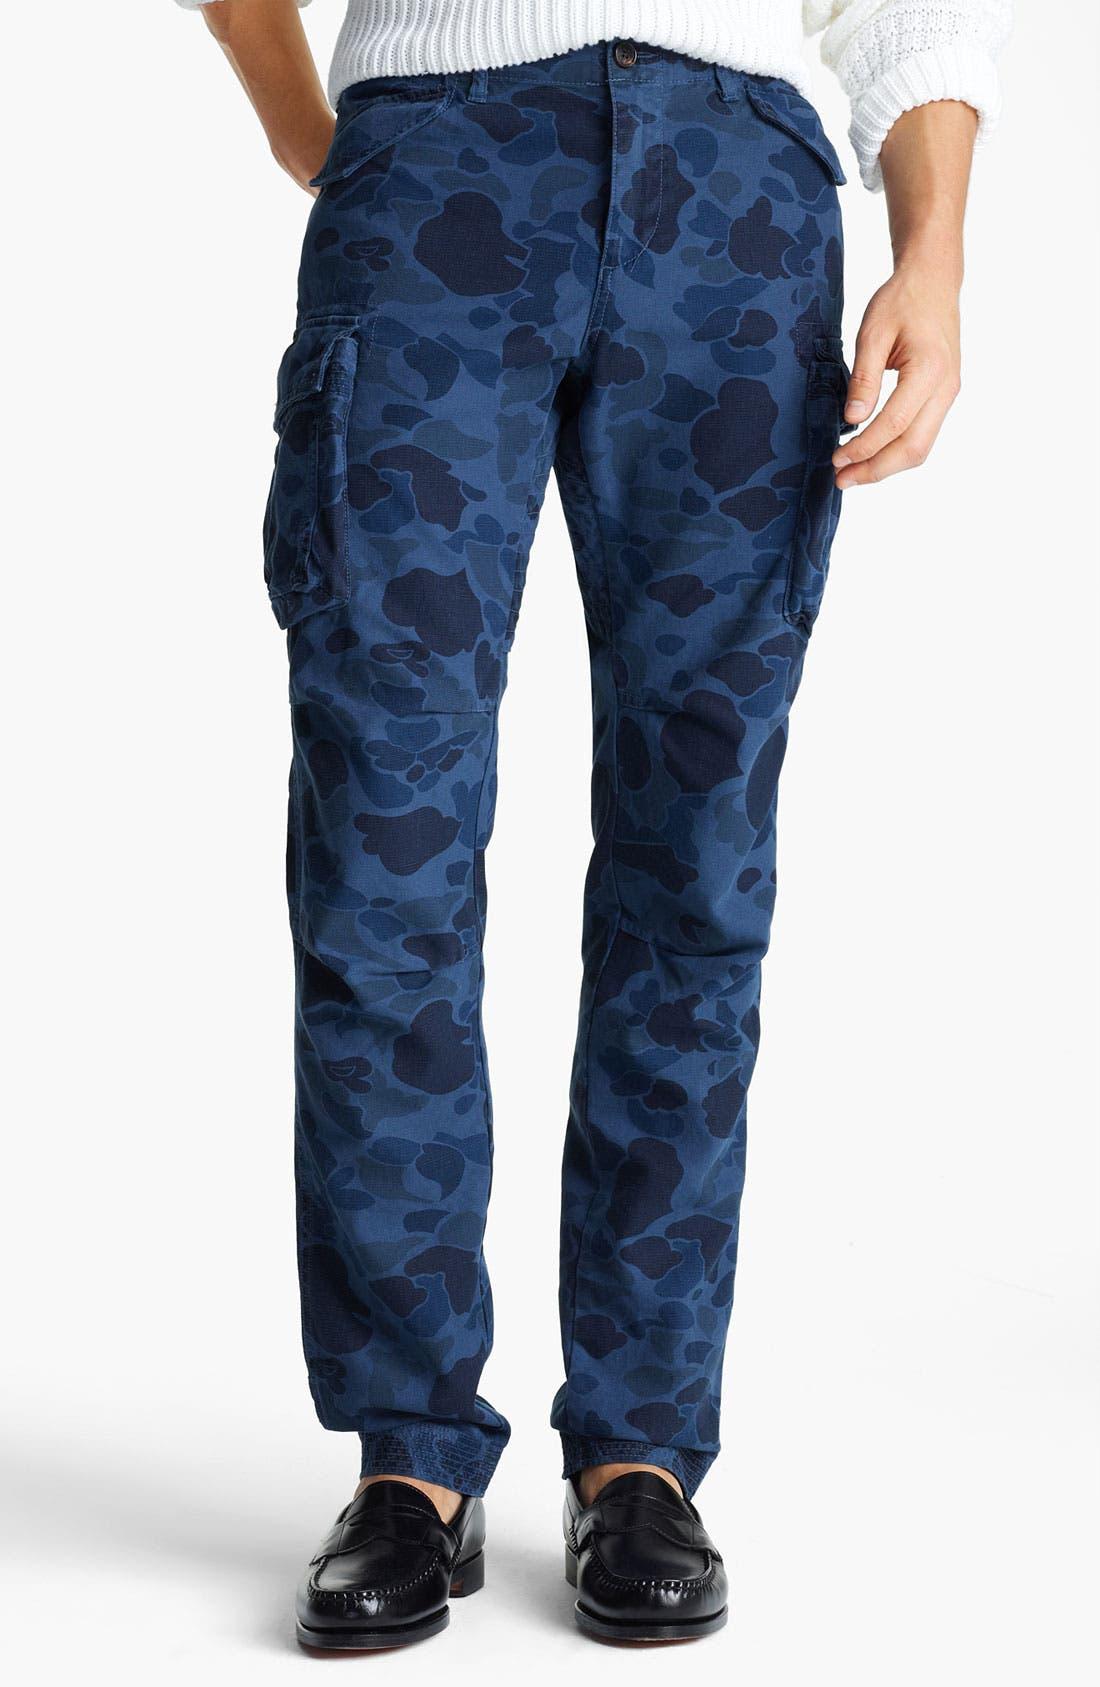 Alternate Image 1 Selected - Gant by Michael Bastian Skinny Camo Cargo Pants